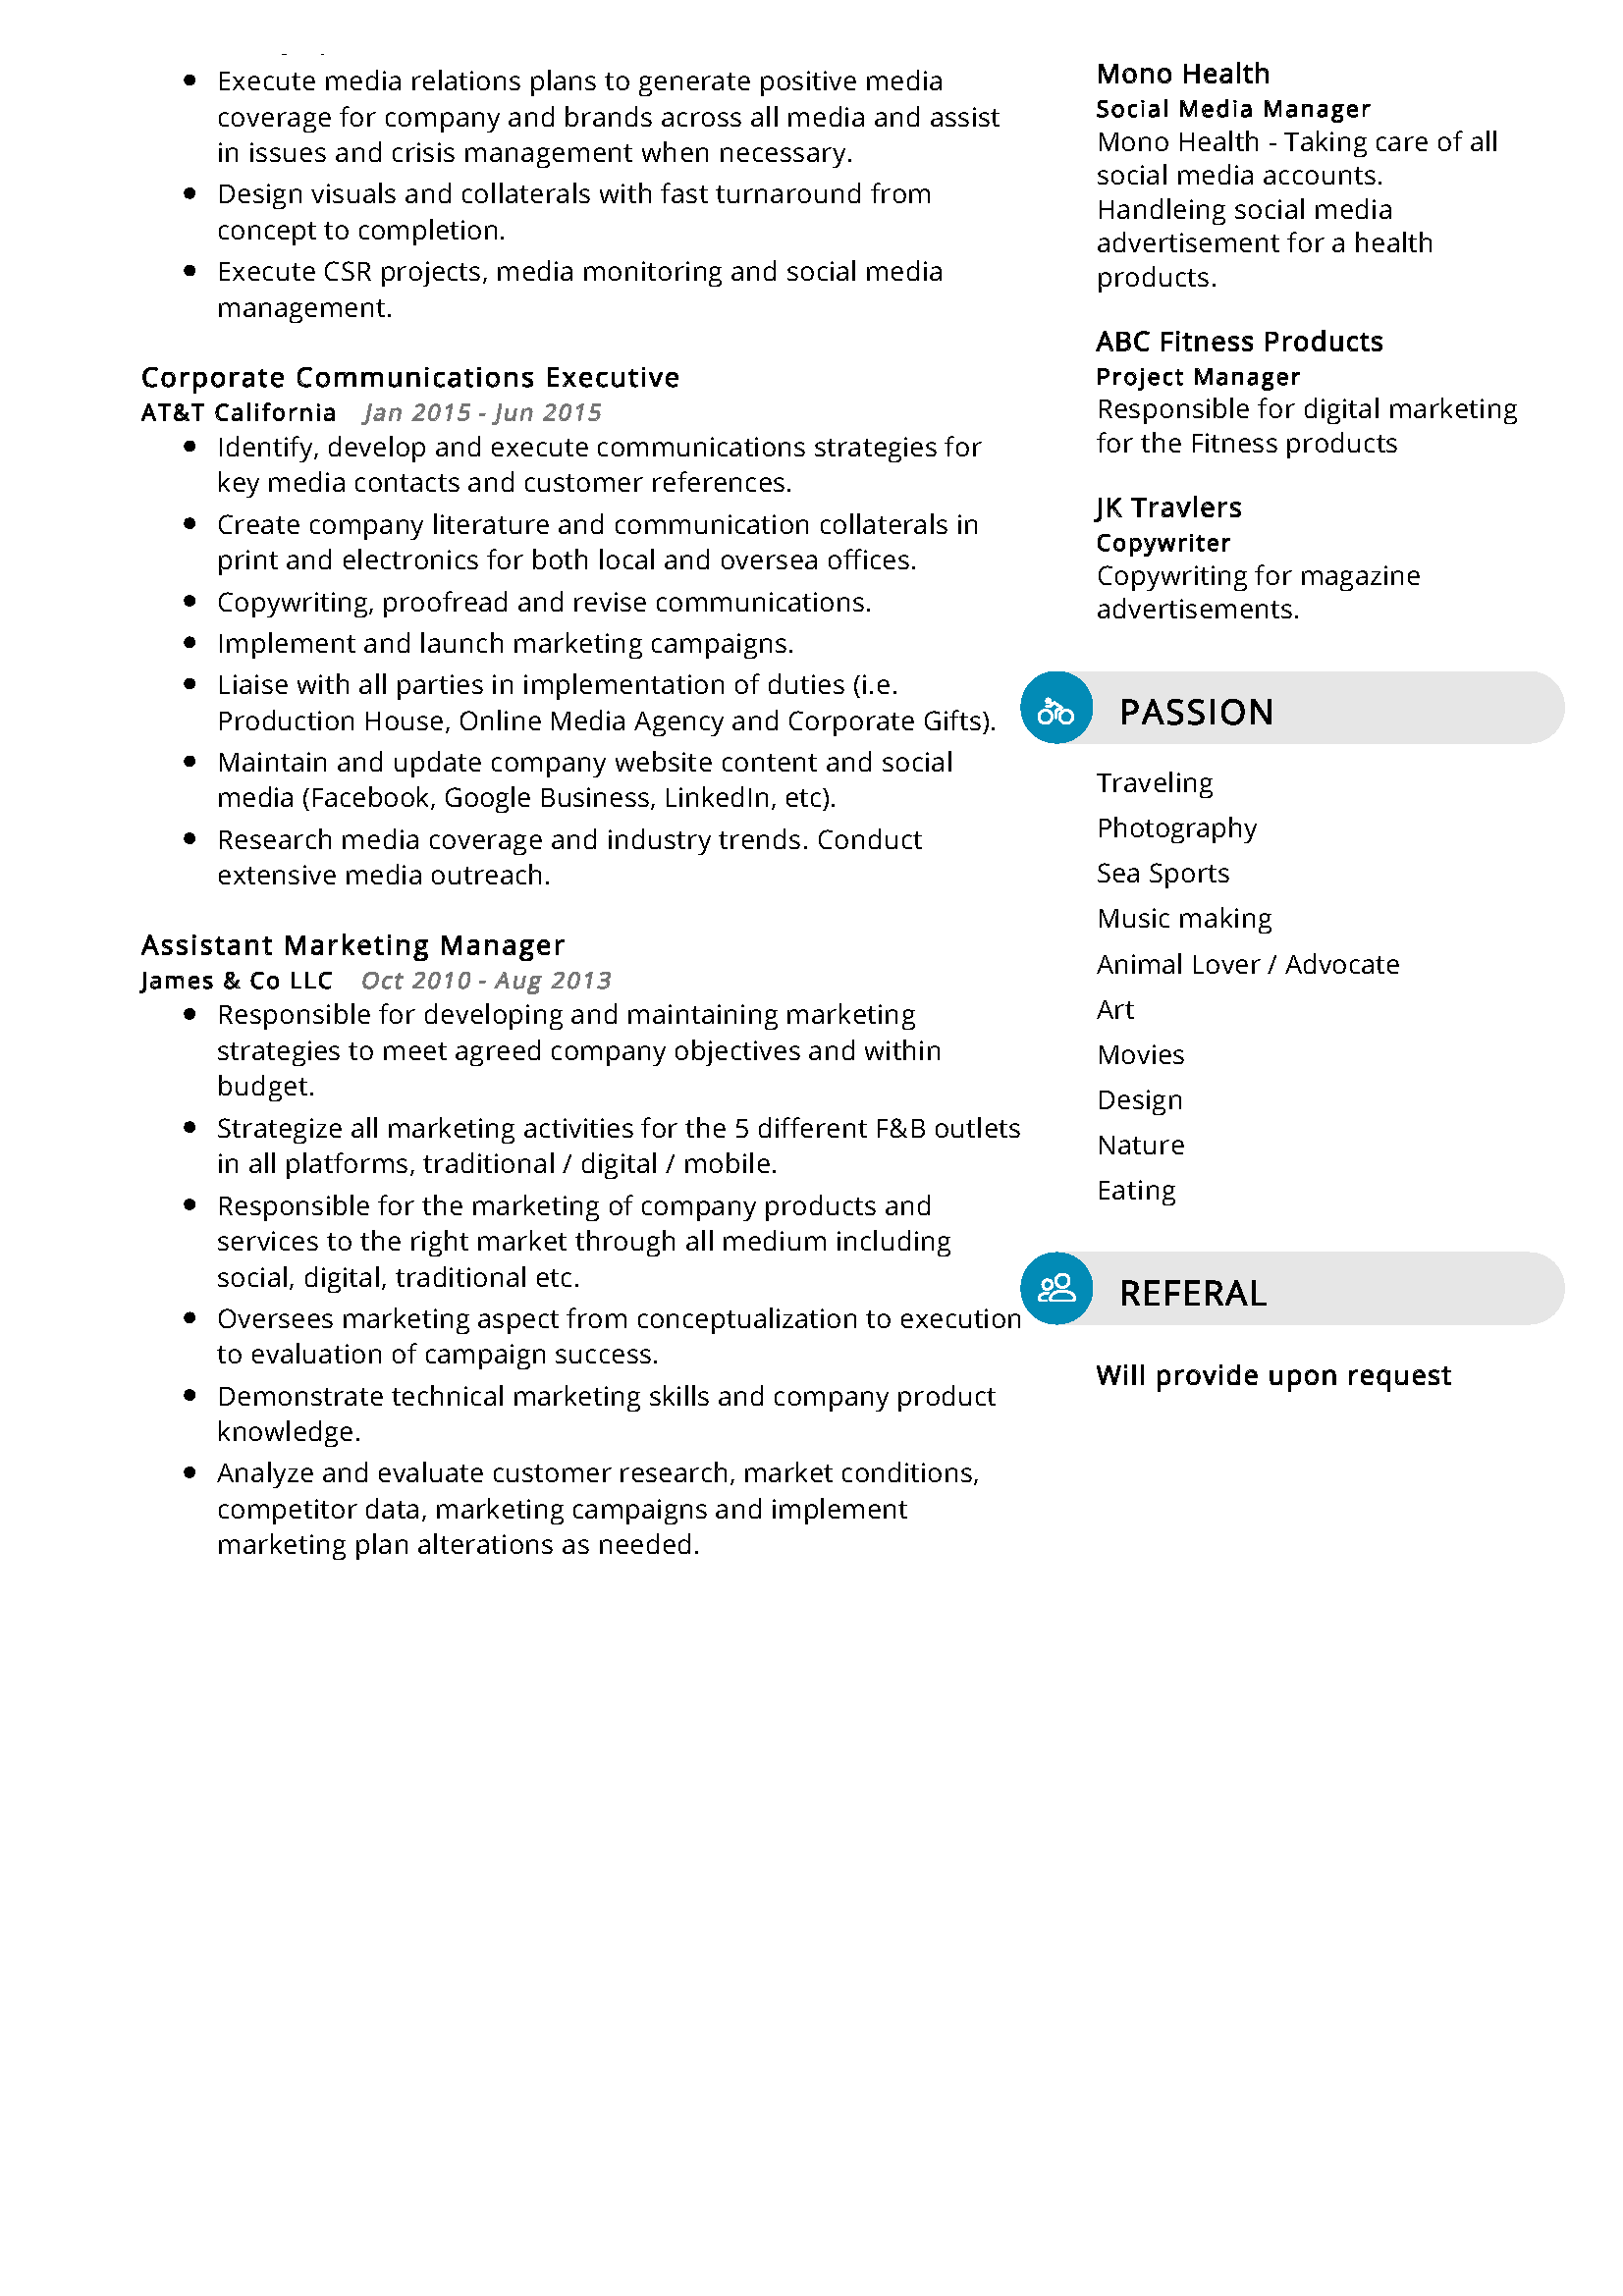 digital marketer resume sample in 2020